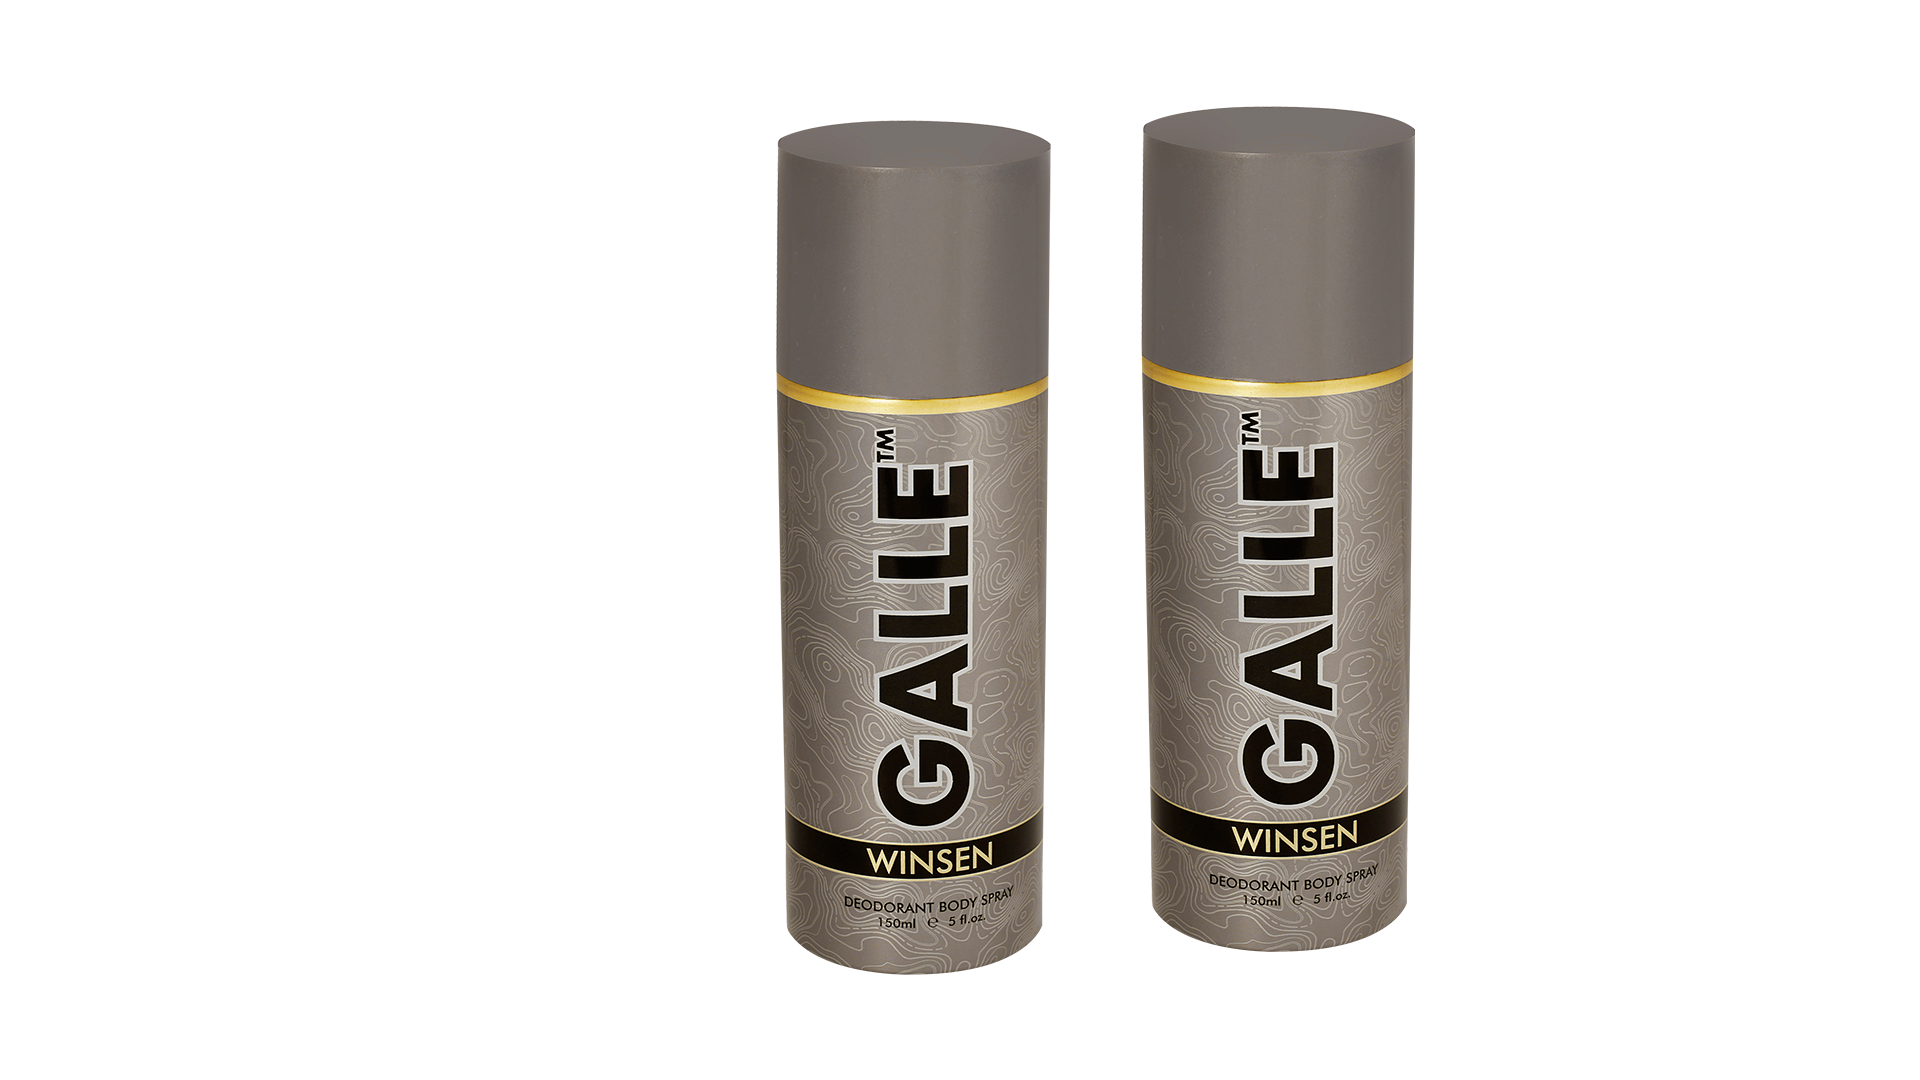 GALLE Winsen Deodorant Body Spray (150 ml each) Pack of 2